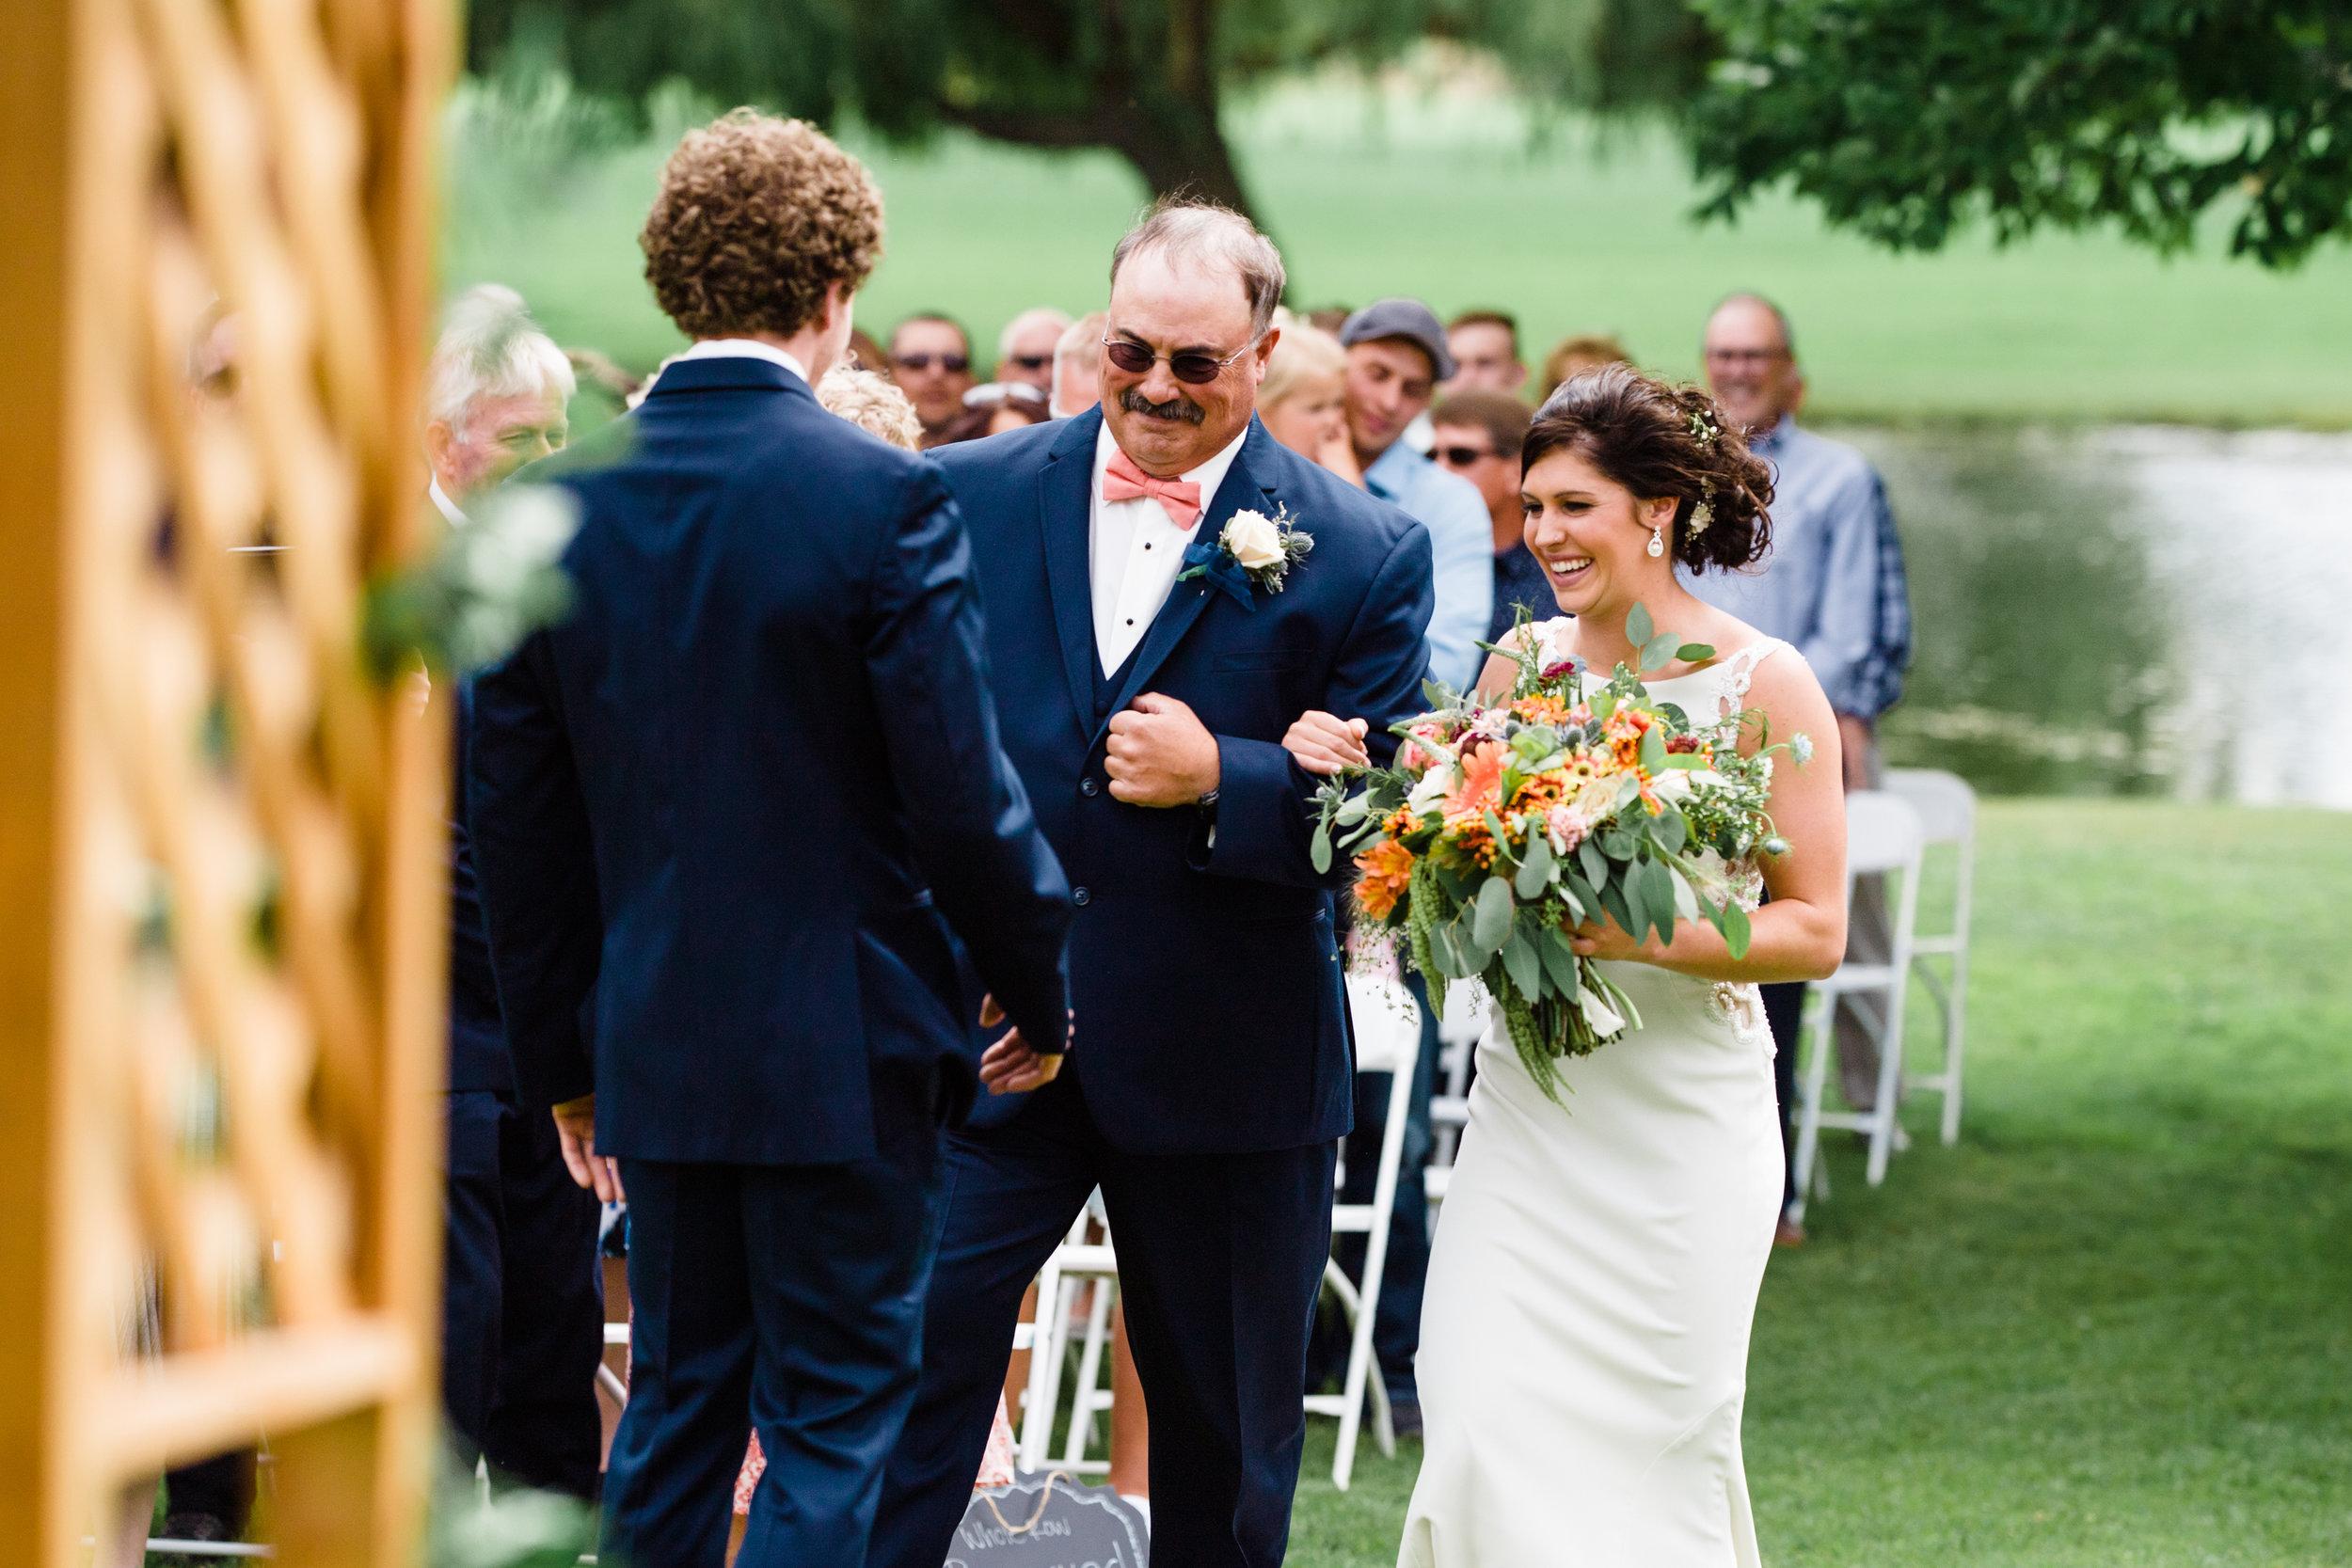 110The Barn at Finley Point Wedding_Montana Wedding Photographer_Katy & Bryce_July 20, 2019-243.jpg